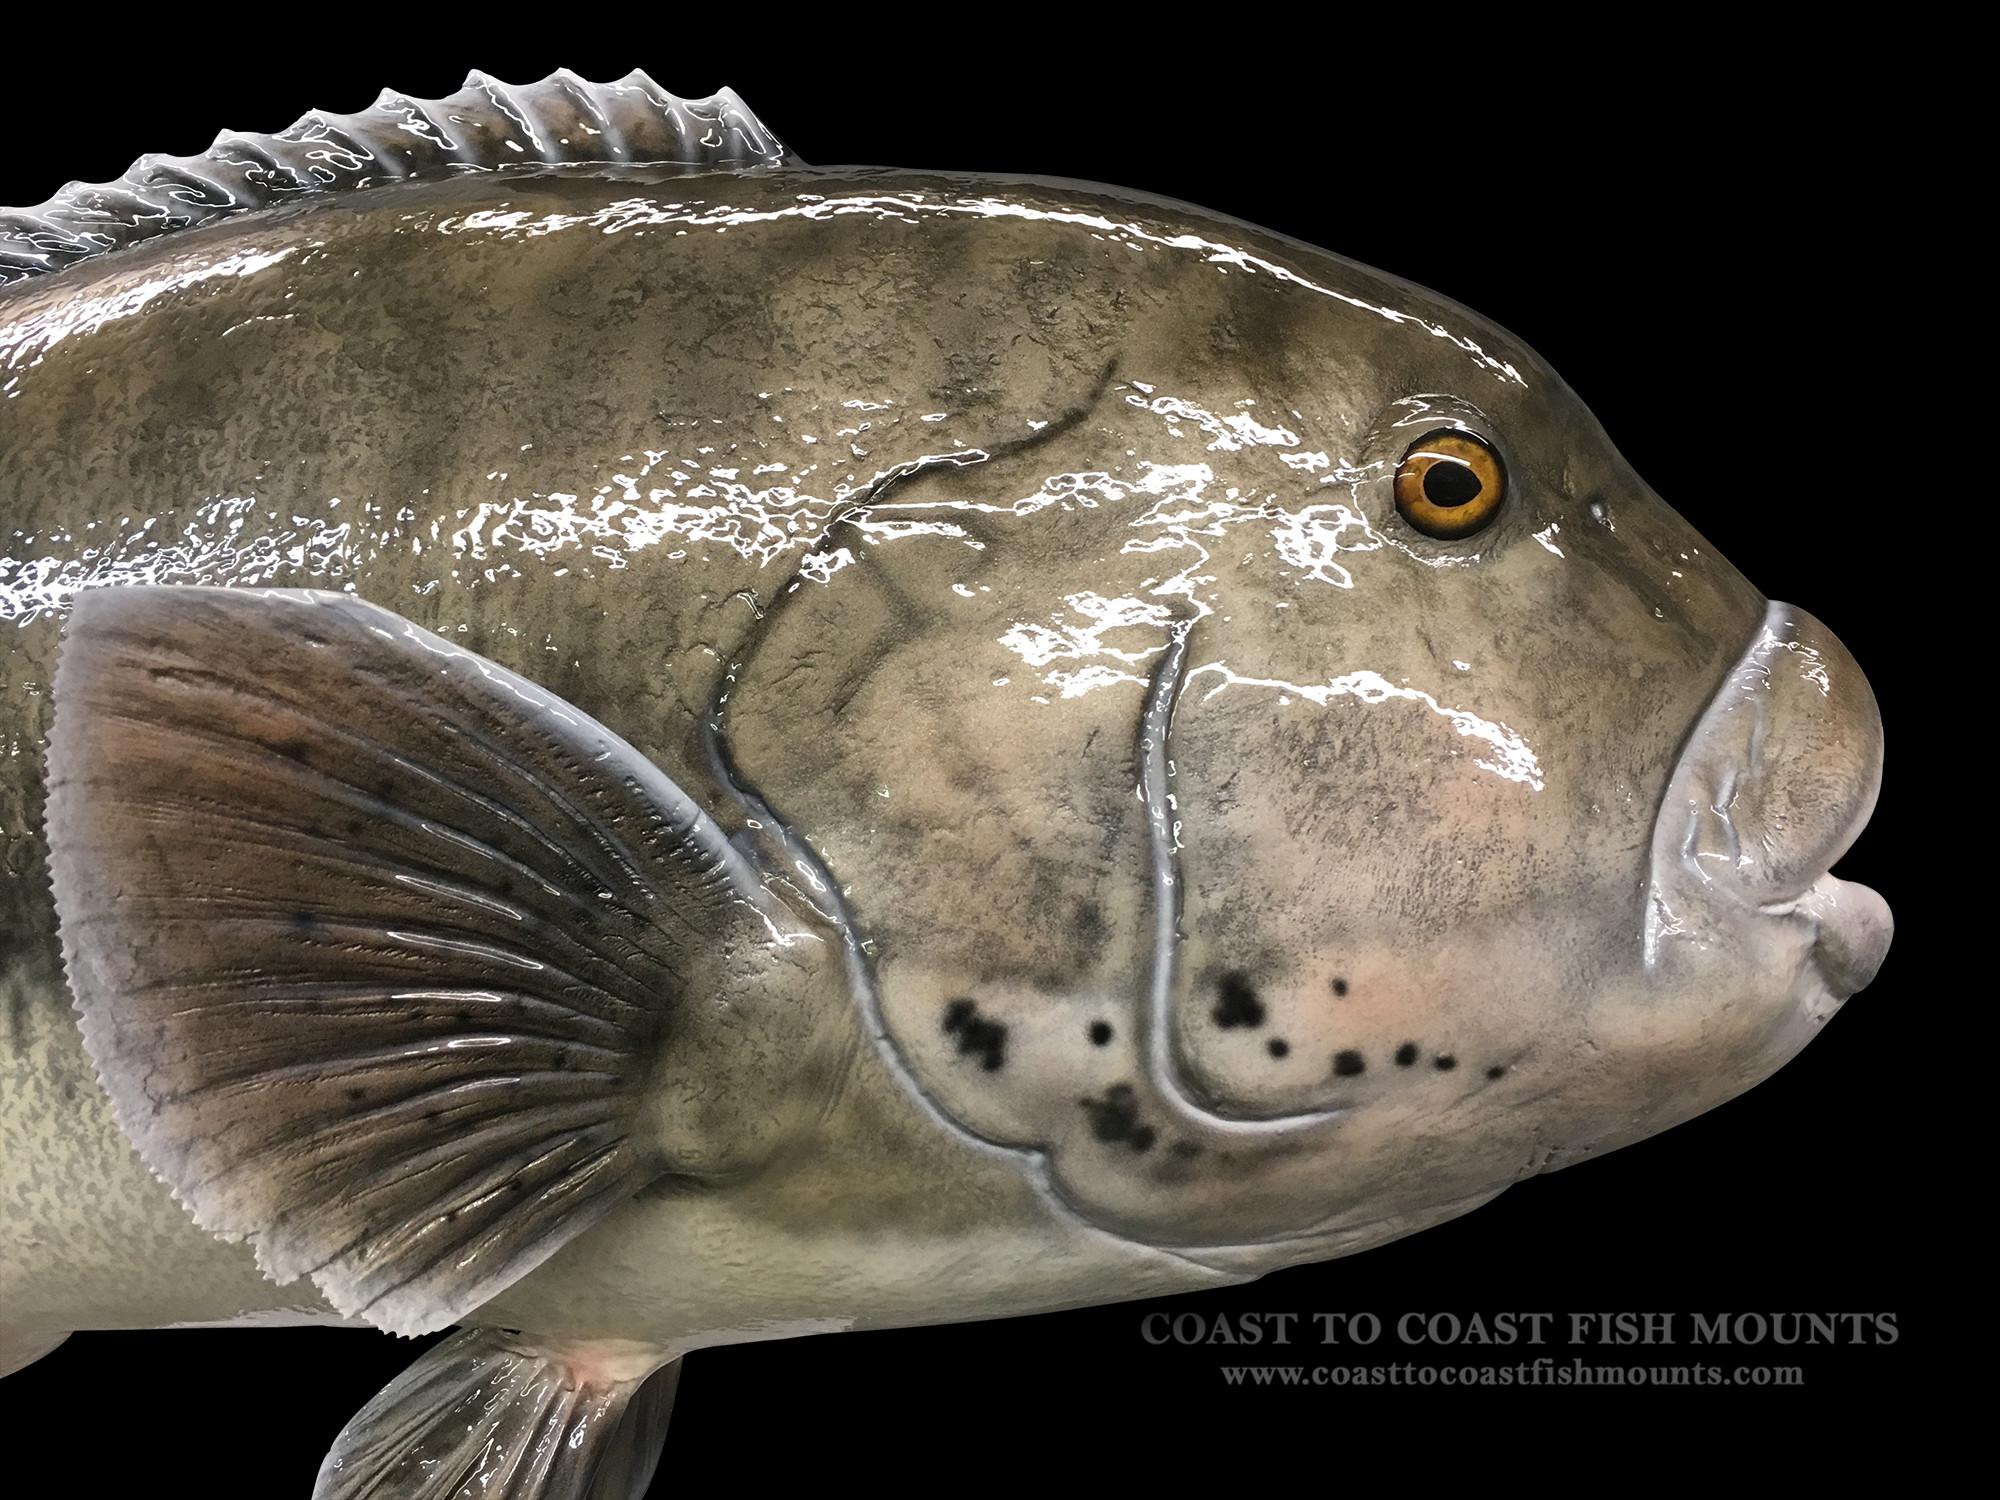 Blackfish Fish Mount and Fish Replicas | Coast-to-Coast